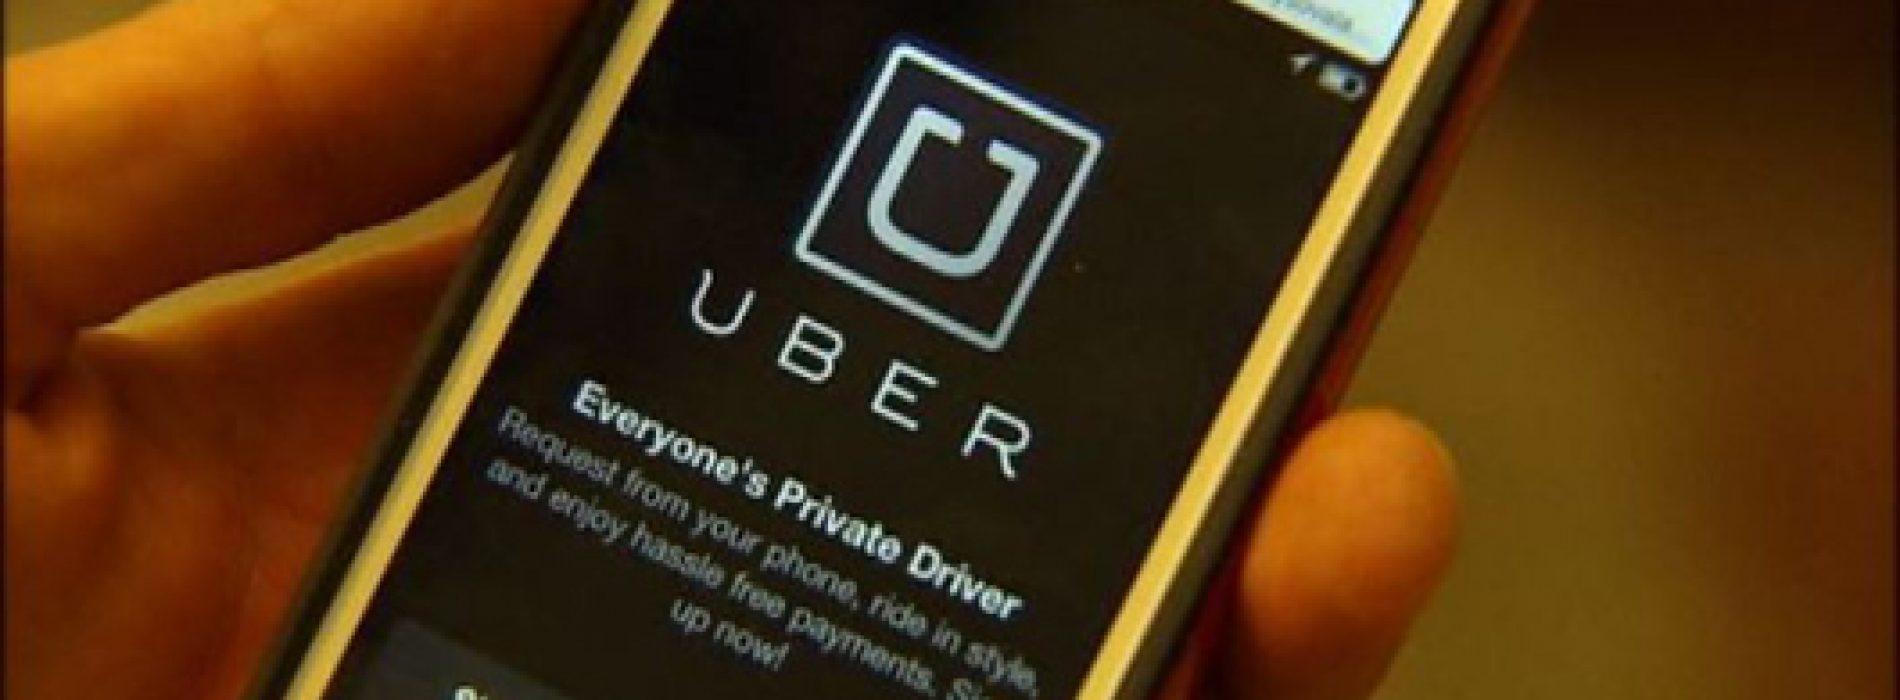 Uber sbarca in Tanzania e lancia i servizi a Dar Es Salaam